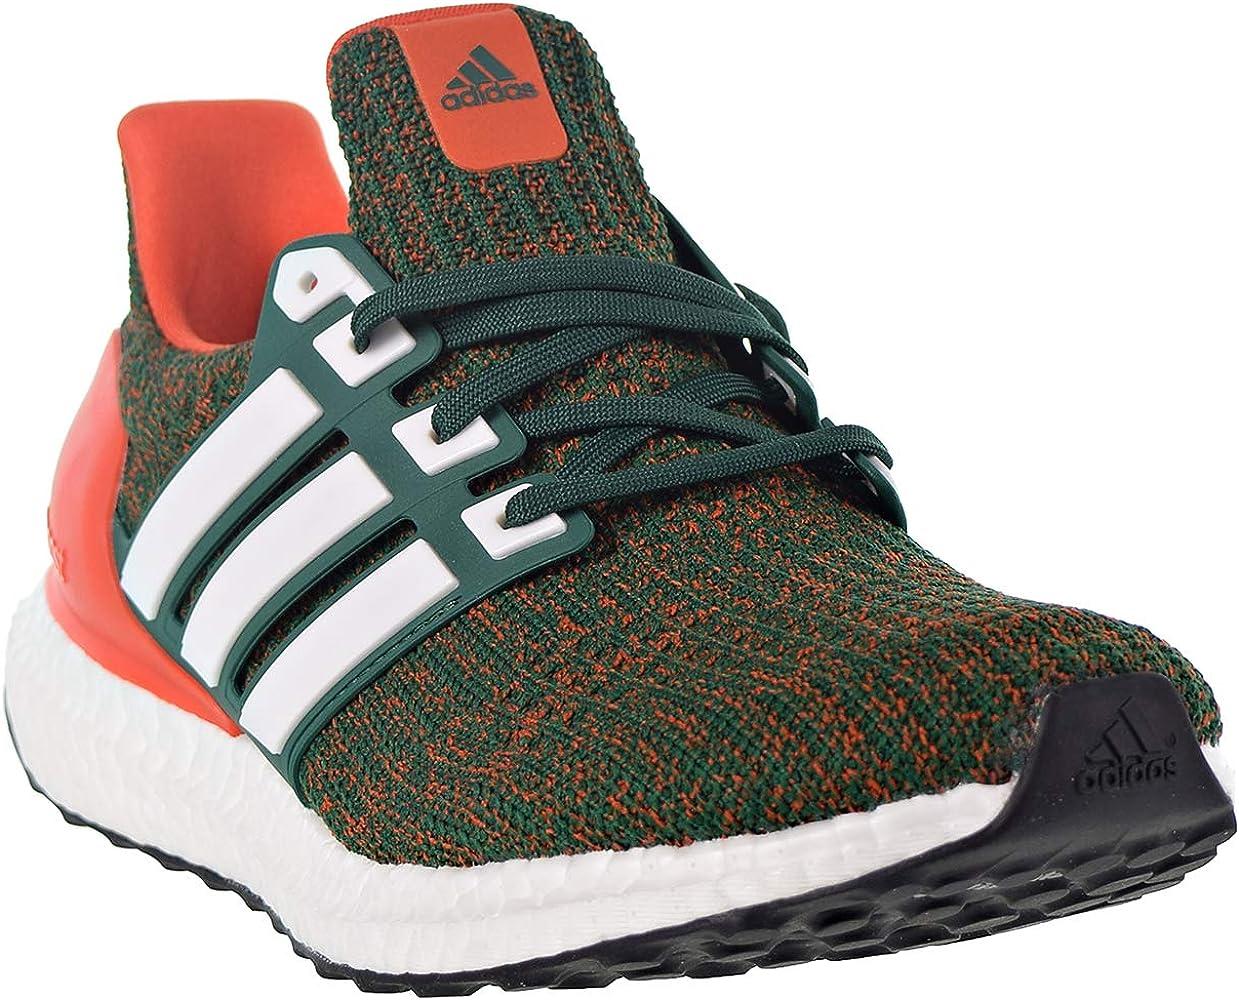 adidas Ultraboost 4.0 Zapatilla para correr para hombre, Verde ...